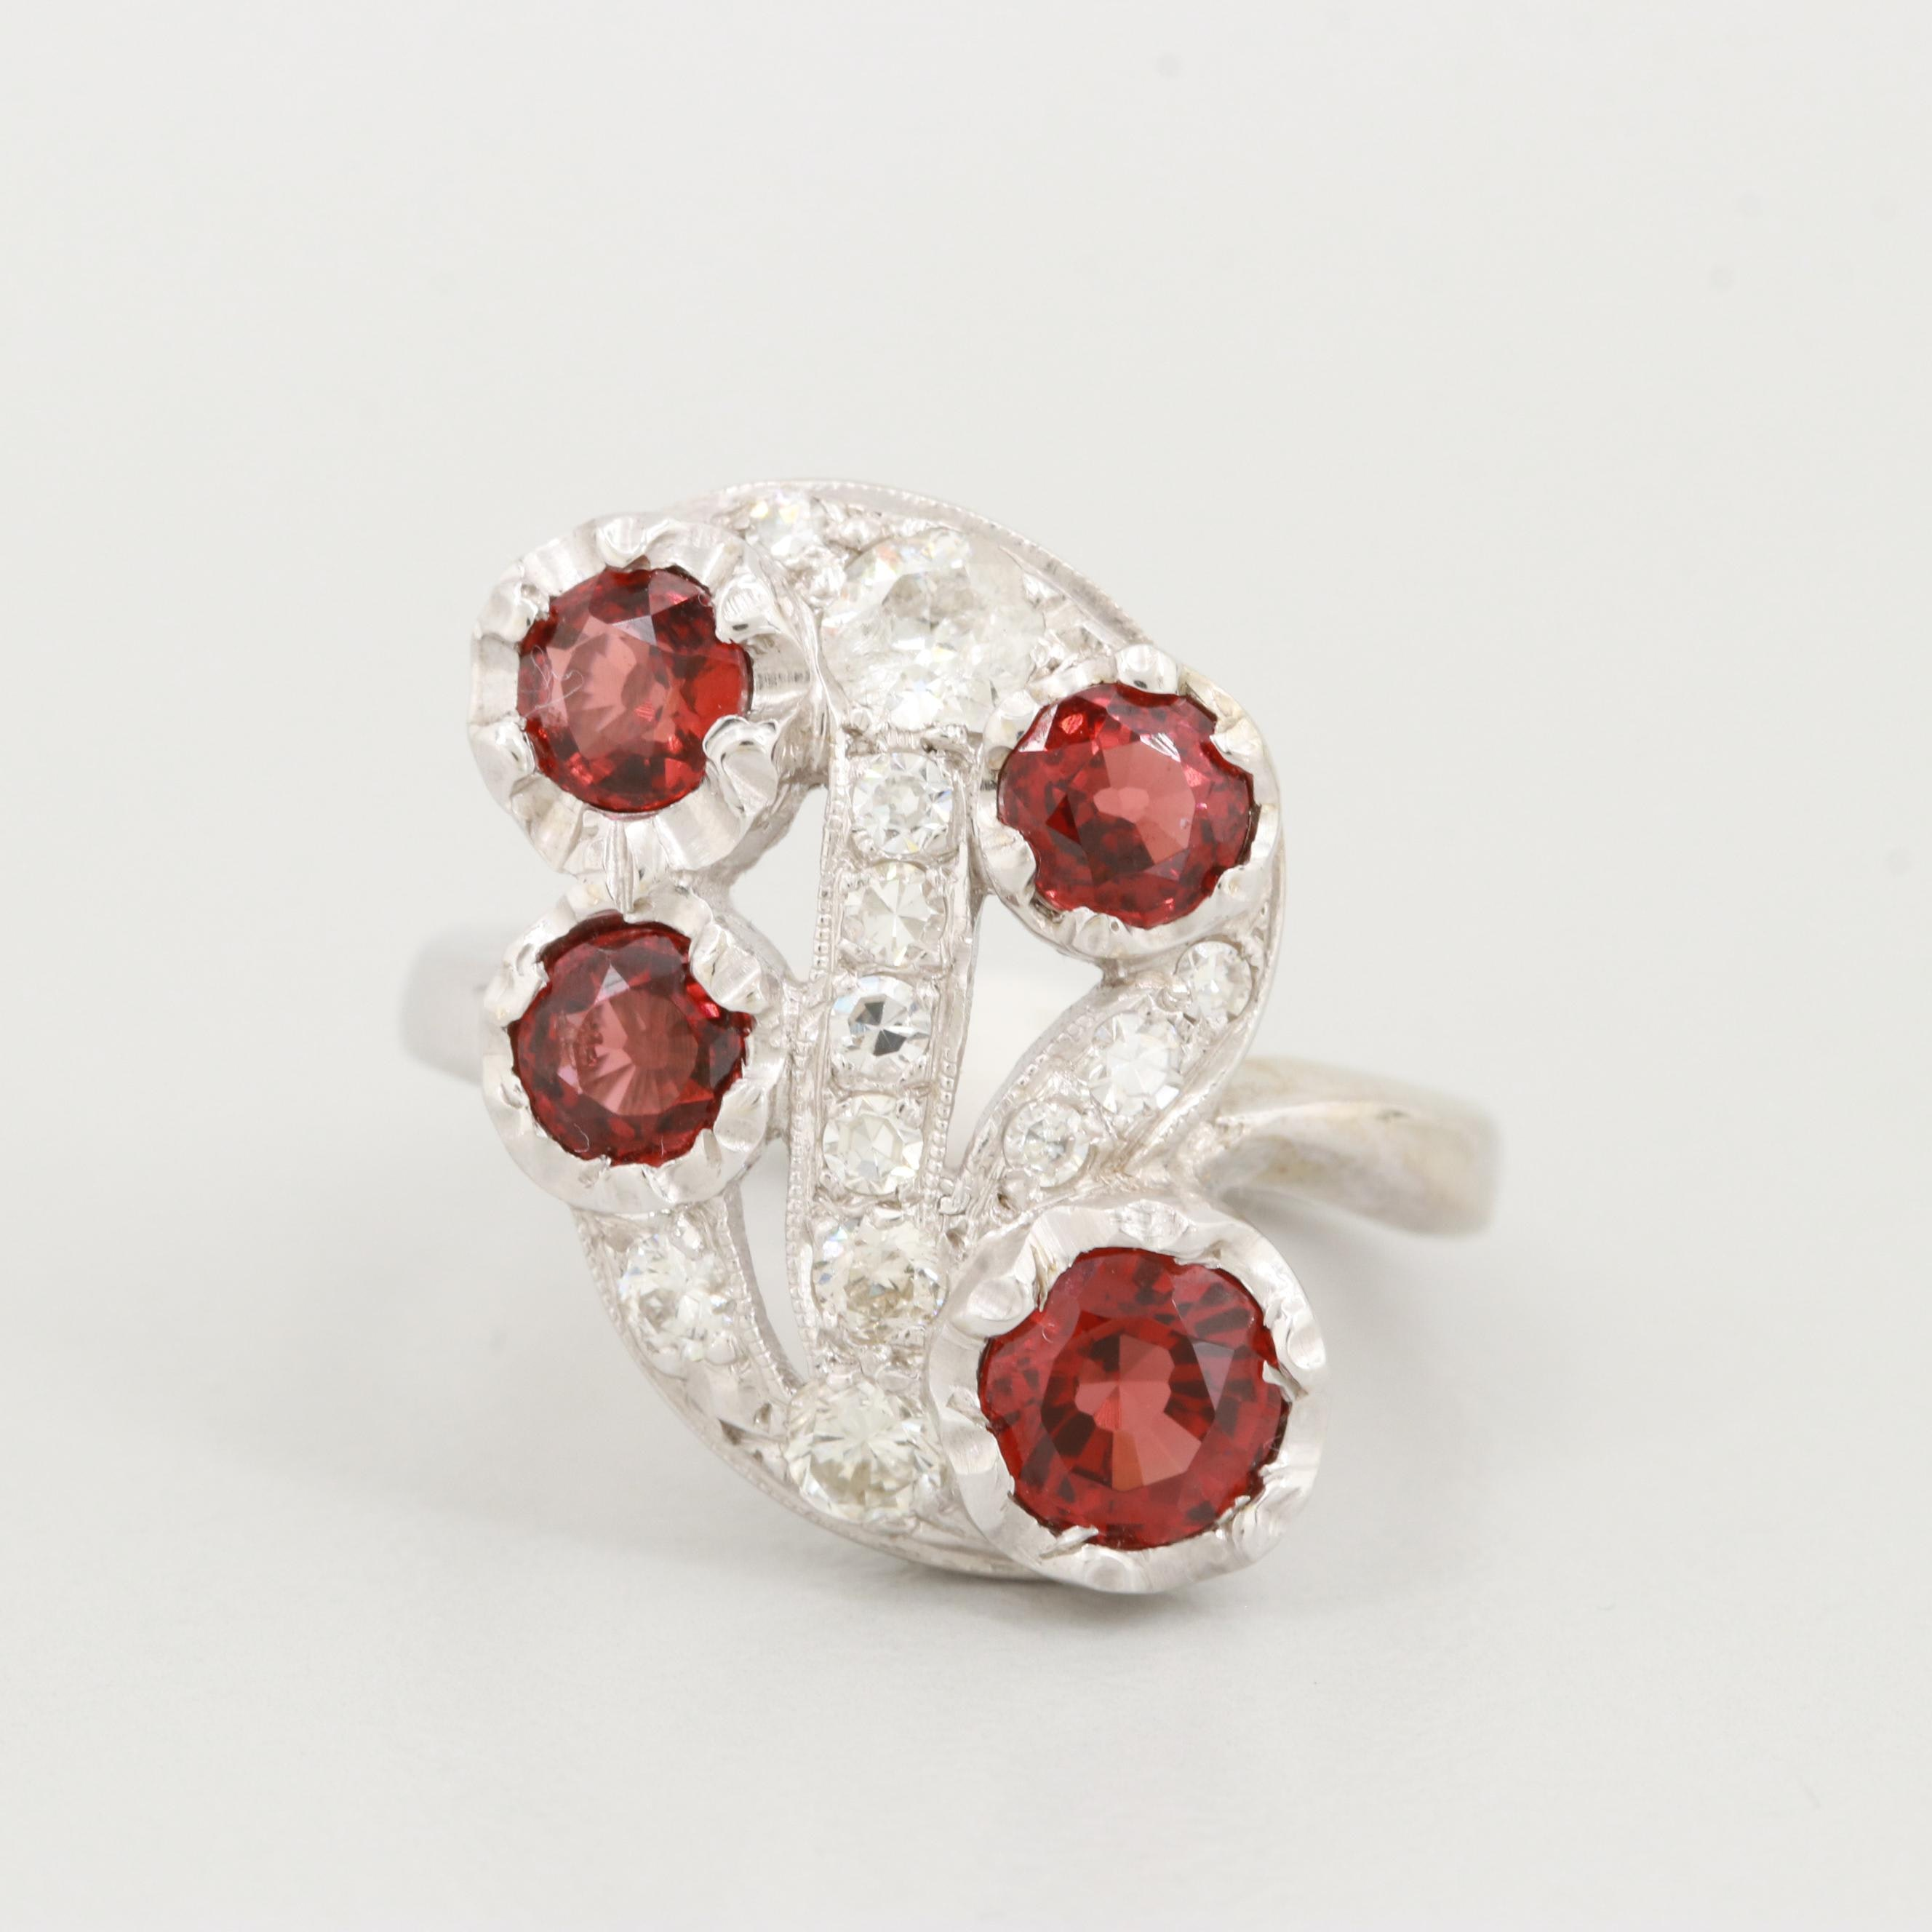 Vintage 14K White Gold Garnet and Diamond Ring